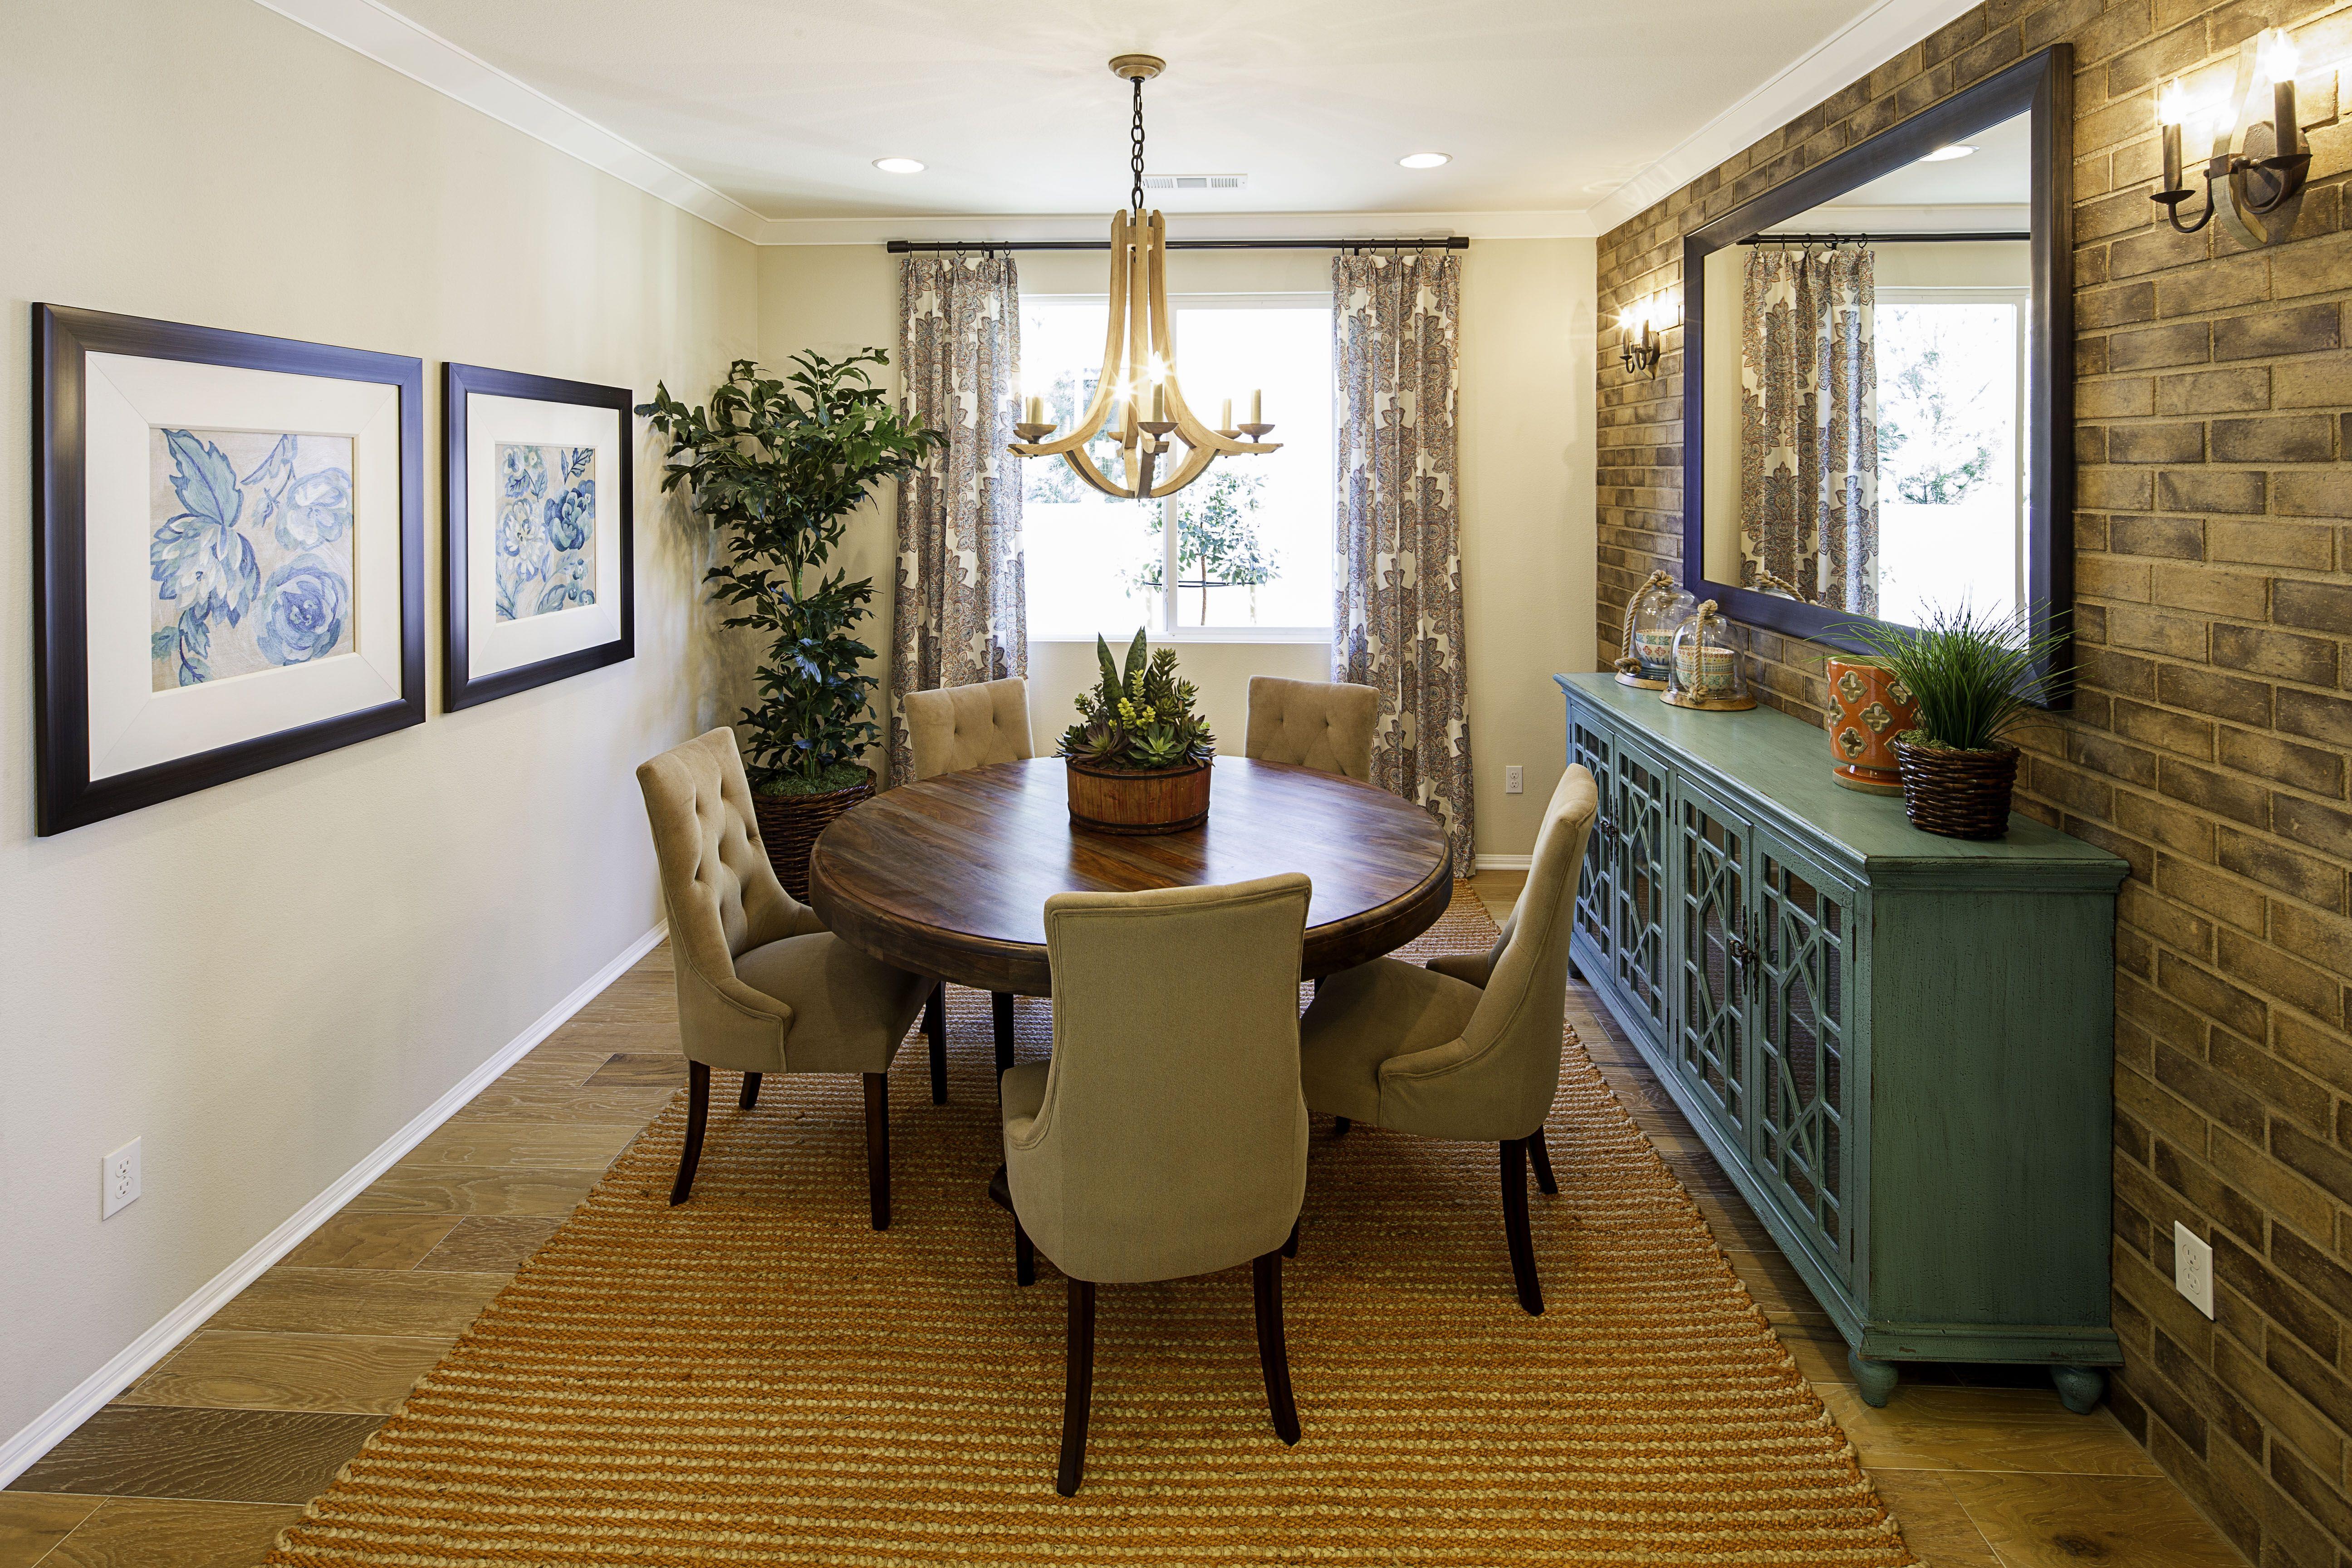 woodside homes marigold menifee ca designitpinitwinit whstyle